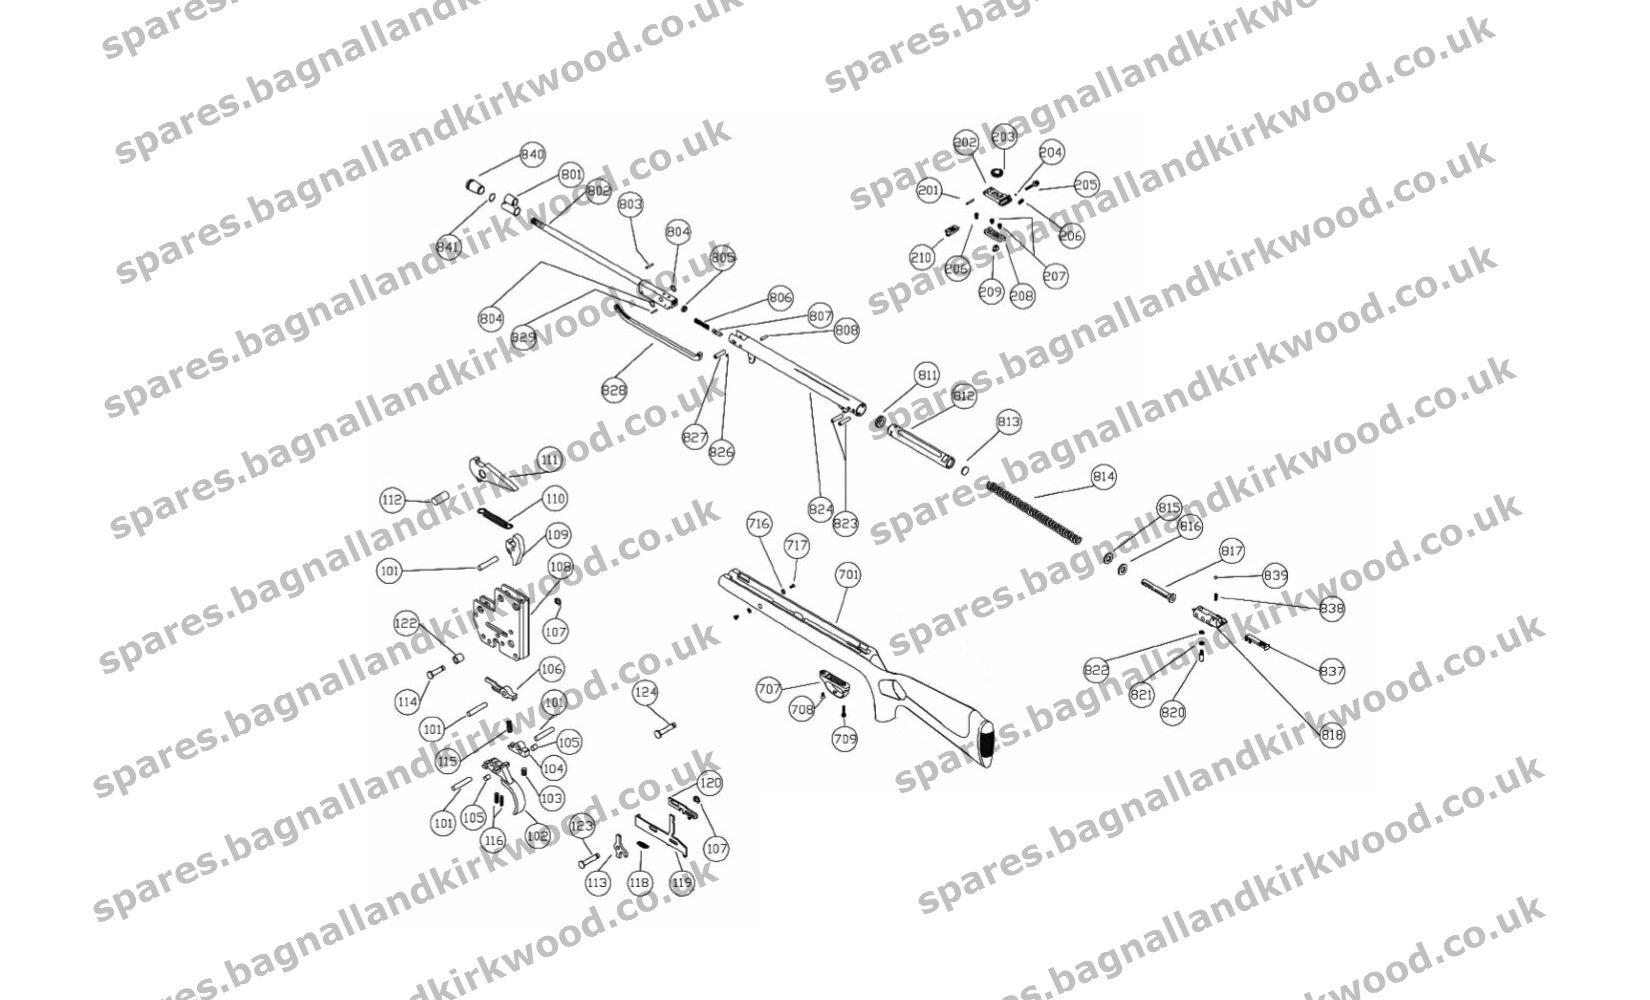 Webley Blackhawk Spare Parts